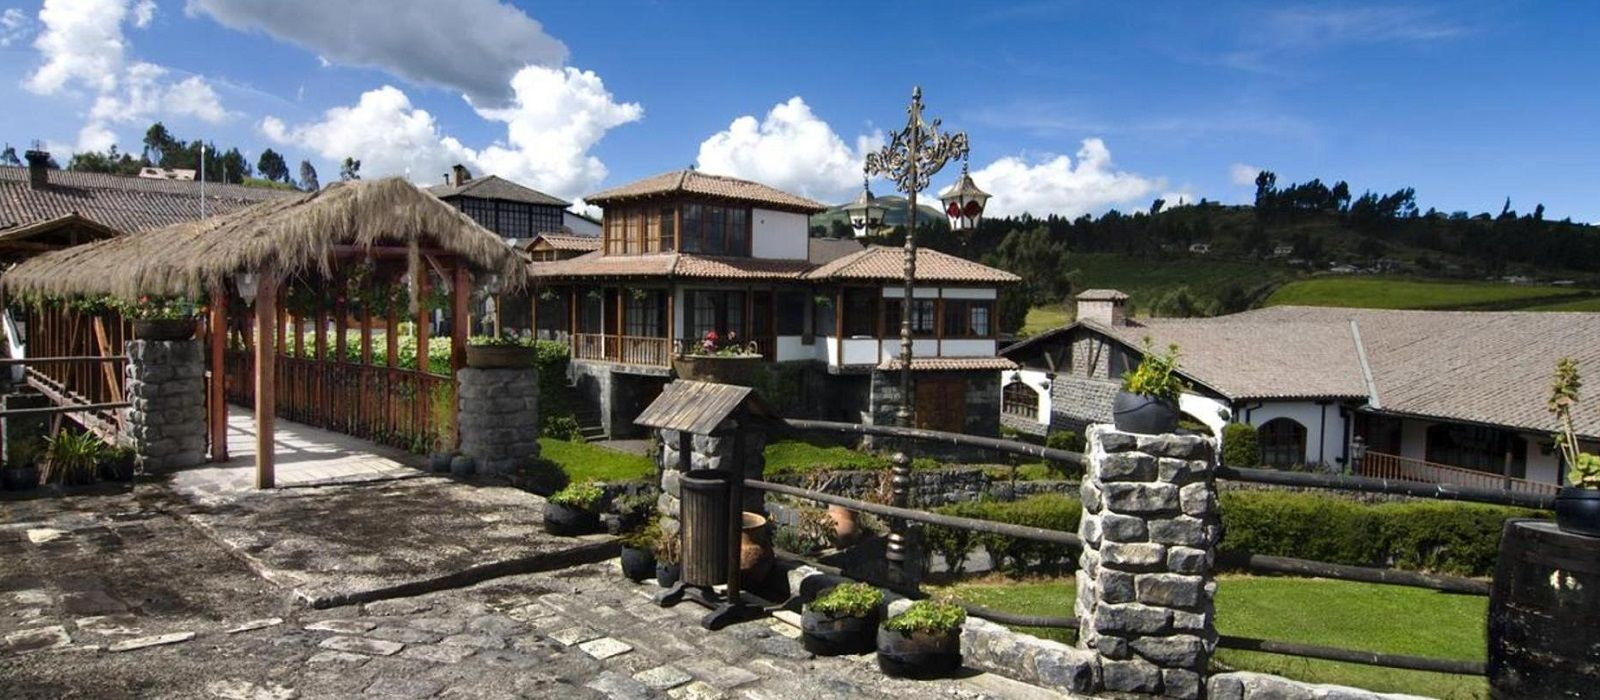 Hotel Hosteria La Andaluza Ecuador/Galapagos